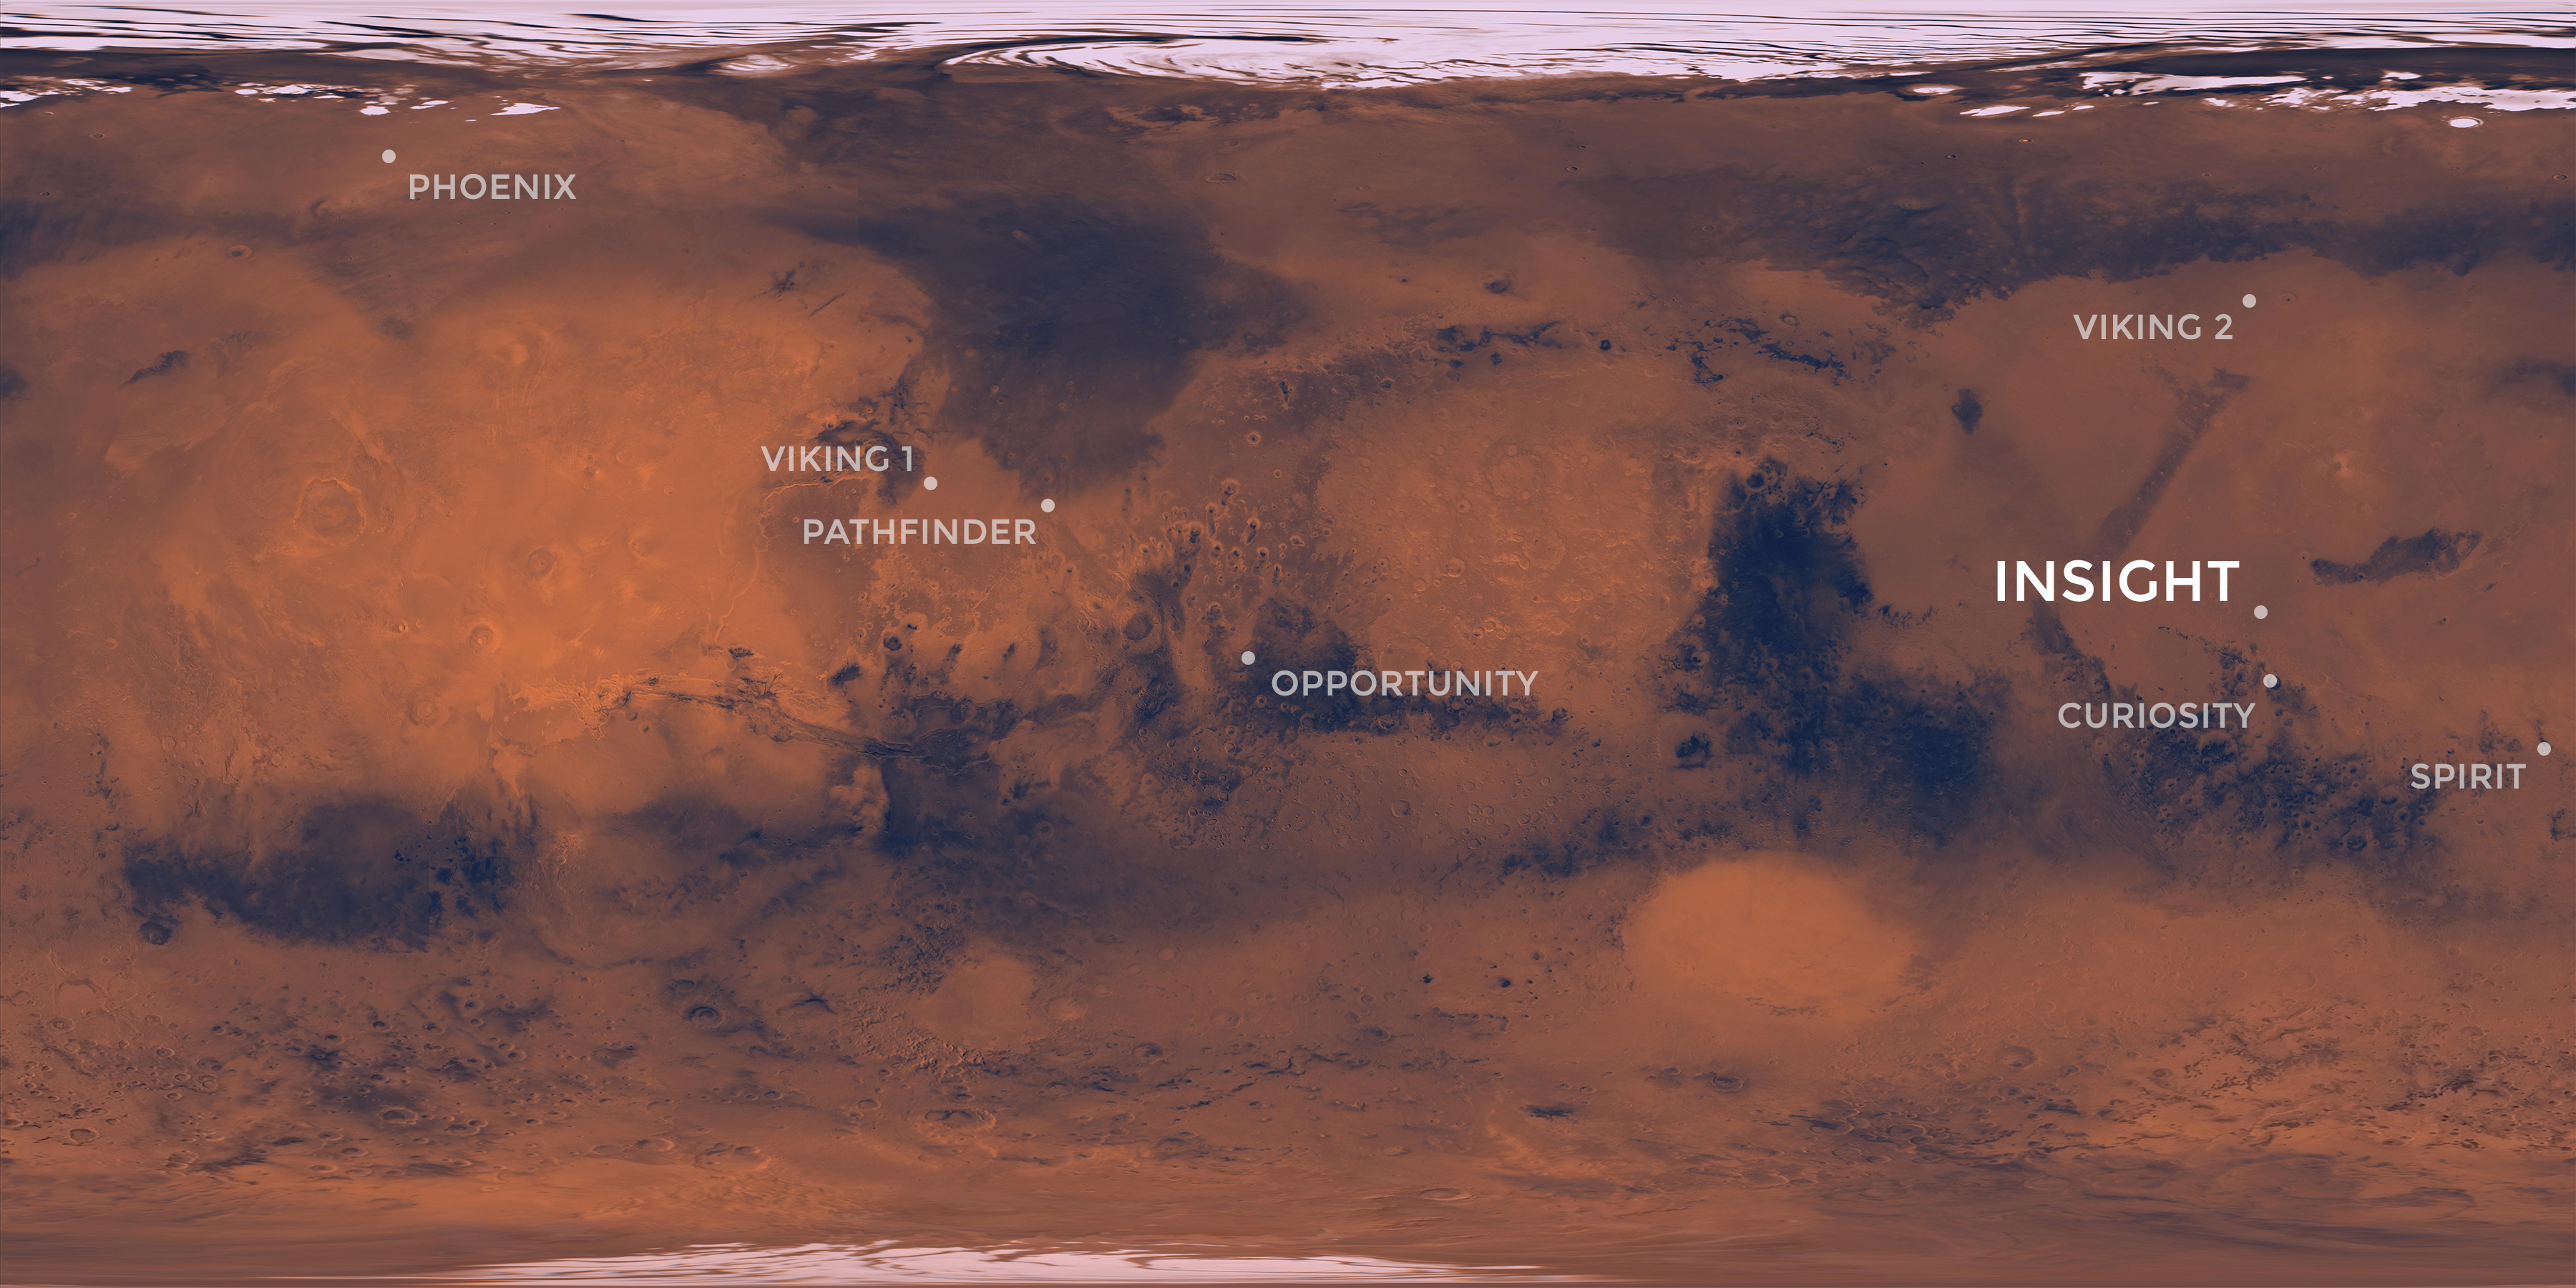 InSight's Landing Site: Elysium Planitia | NASA Solar System